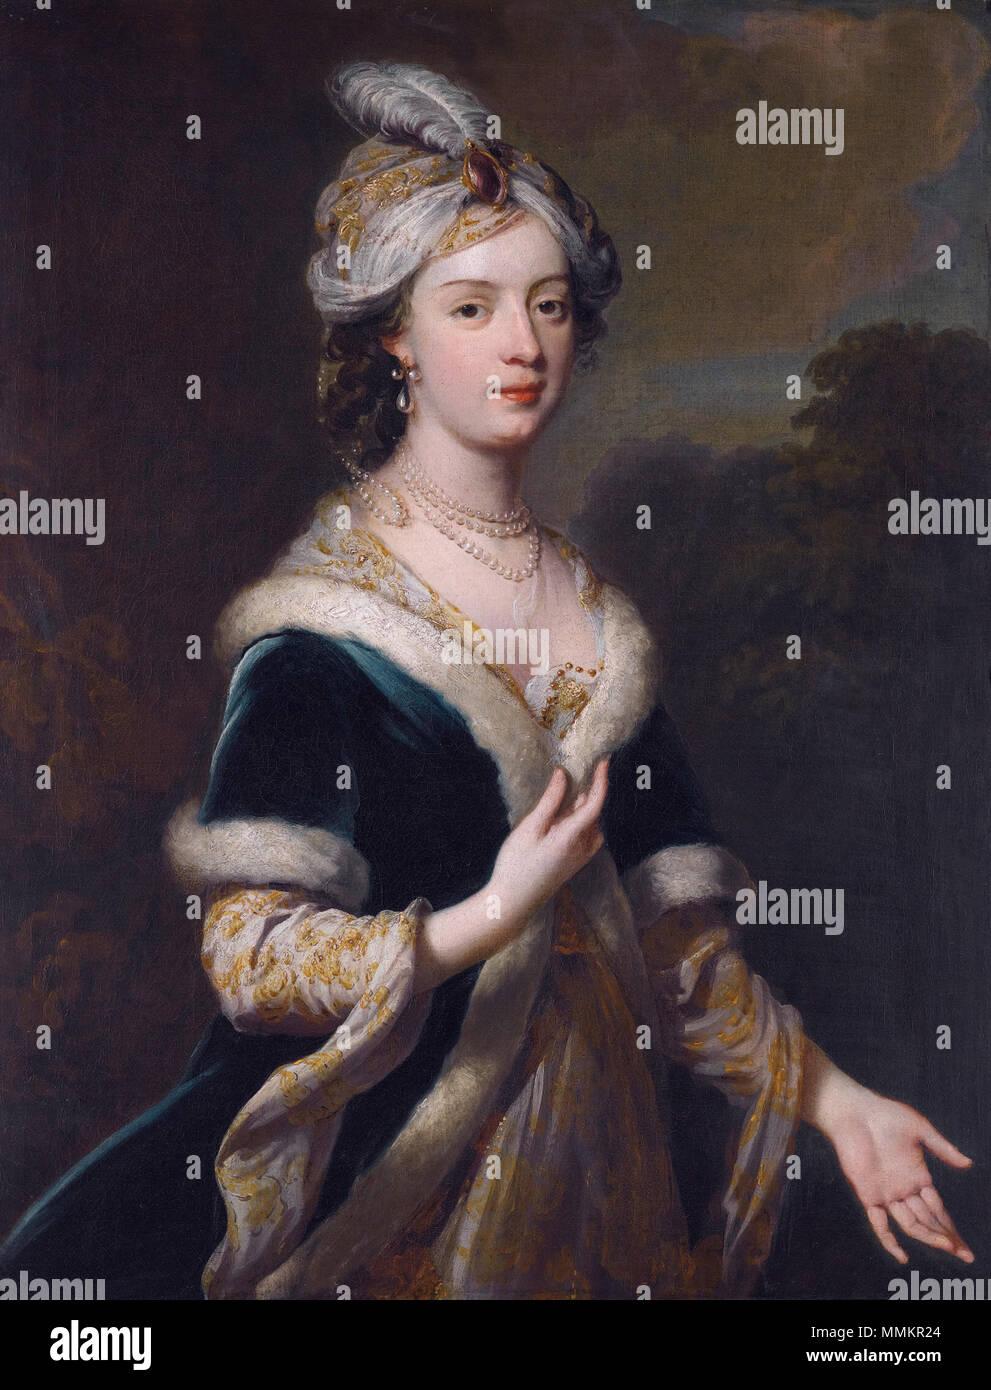 . Inglese: Elizabeth Howard (1701-1739), figlia di Charles Howard, 3° Conte di Carlisle, in costume turco Elizabeth Howard (1701-1739), figlia di Charles Howard, 3° Conte di Carlisle, in costume turco *olio su tela *91 x 71 cm *circa 1830 Elizabeth Howard (1701-1739), da George Knapton Immagini Stock